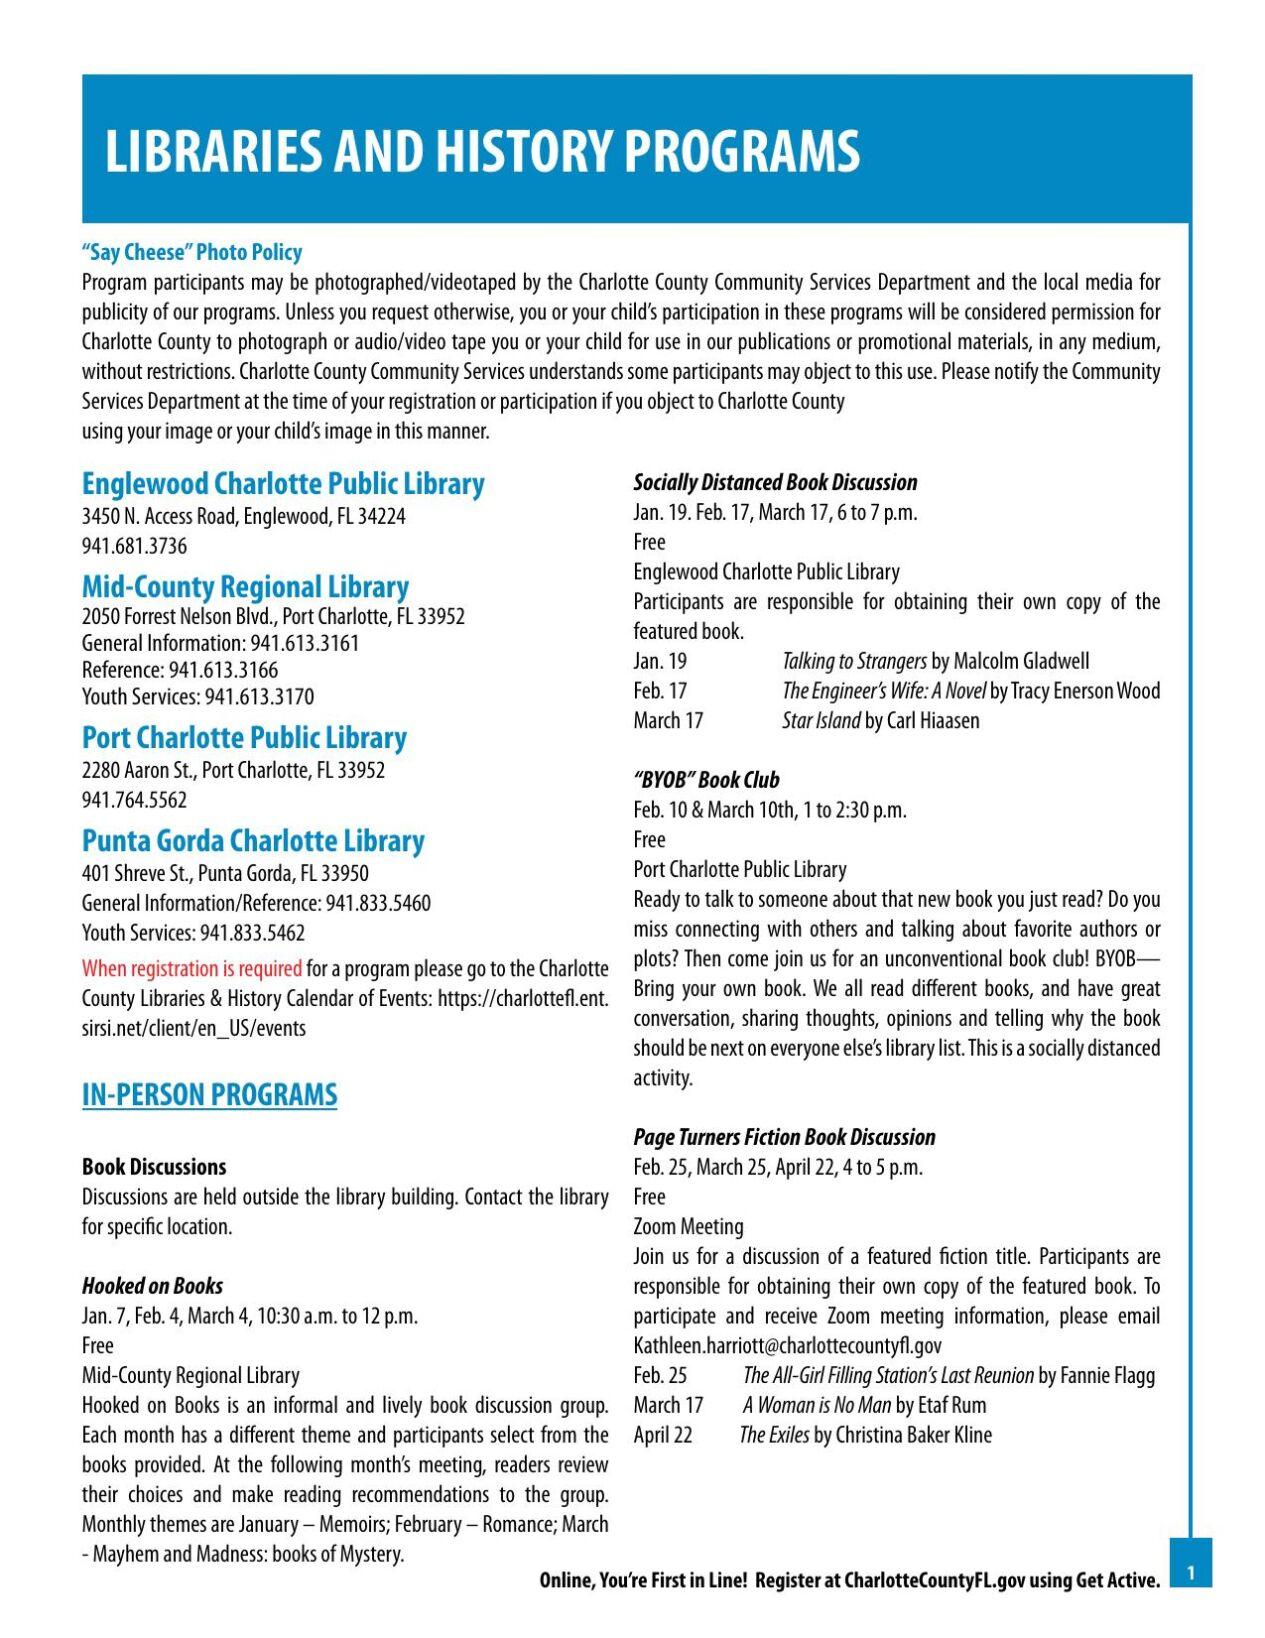 Charlotte County Centennial Program